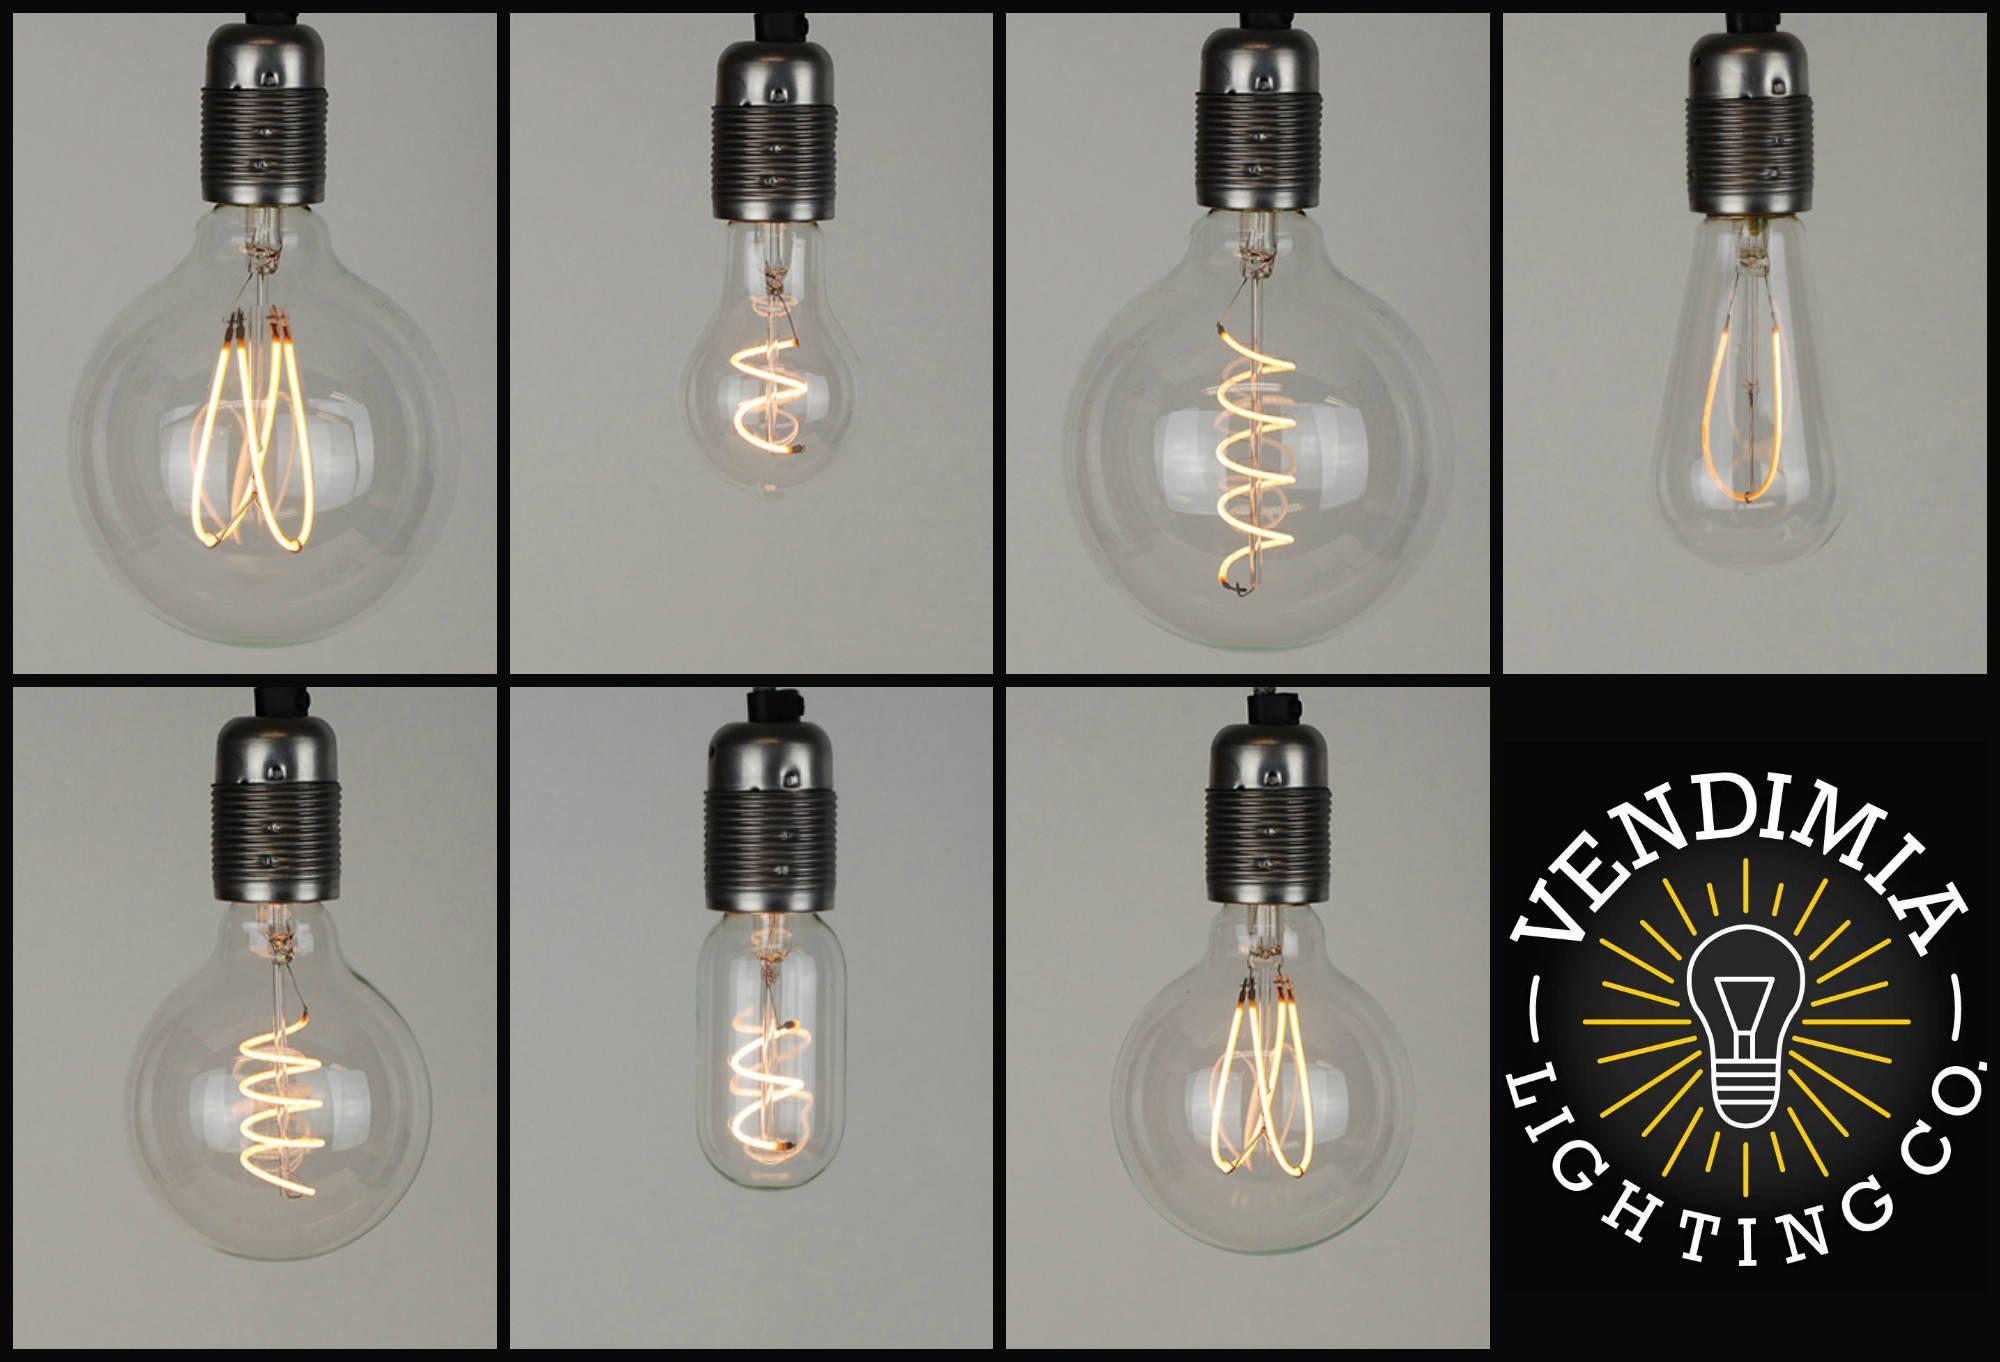 Vintage Industrial Stil Flexible Led Filament Edison Gluhbirne E27 Es Schraube Lampe 4w Mit Stoffkabel Vintage Industrial Style Industrial Style Vintage Industrial